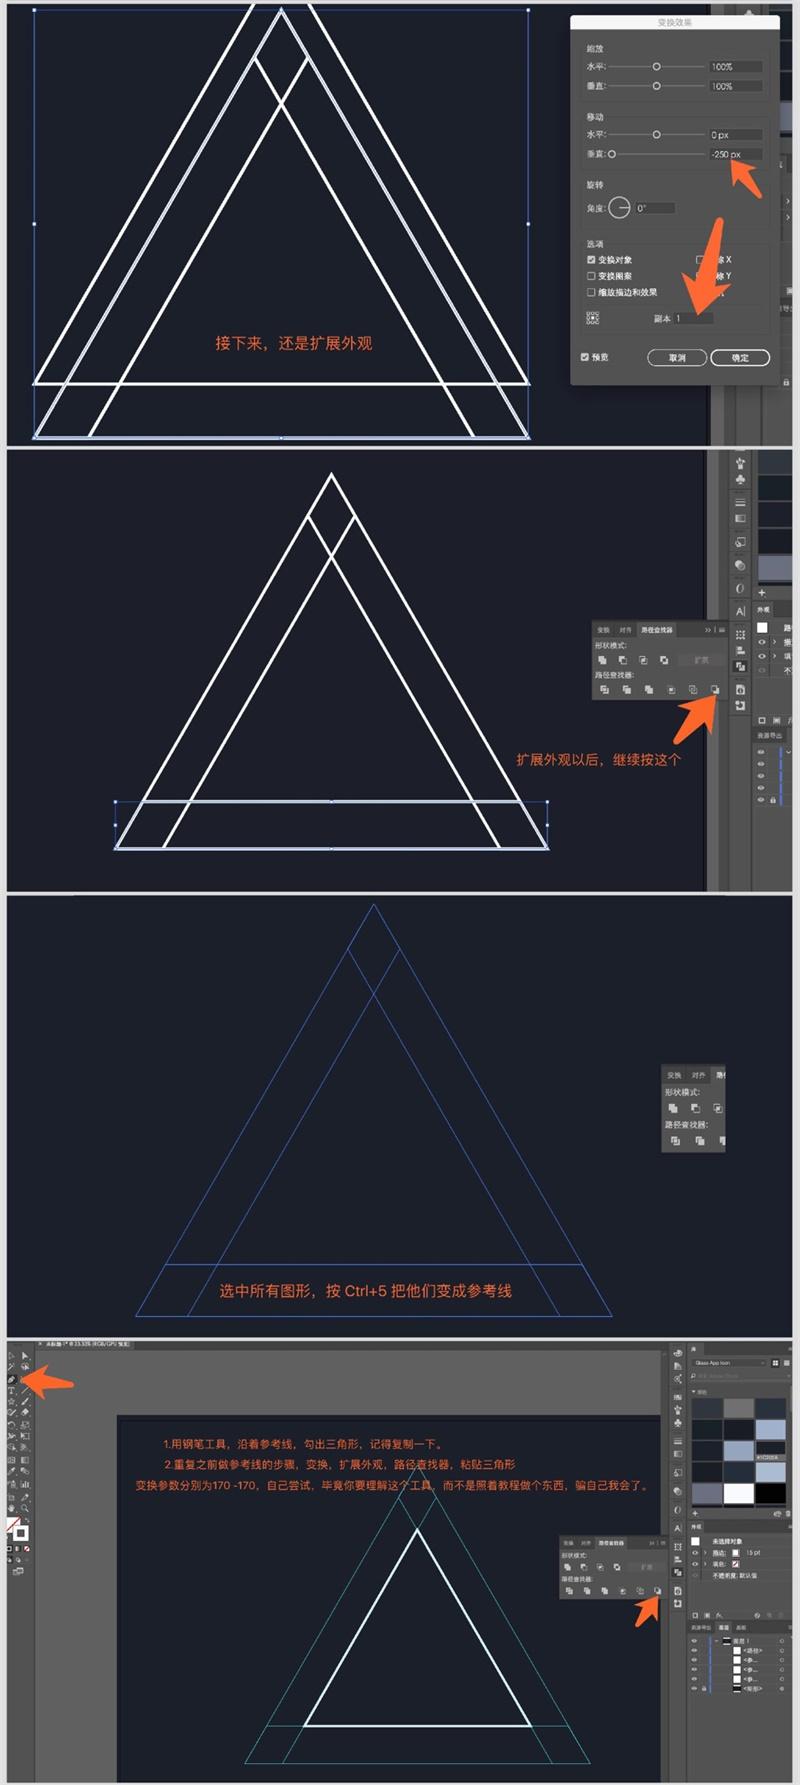 AI教程!6分钟快速上手酷炫的潘洛斯三角